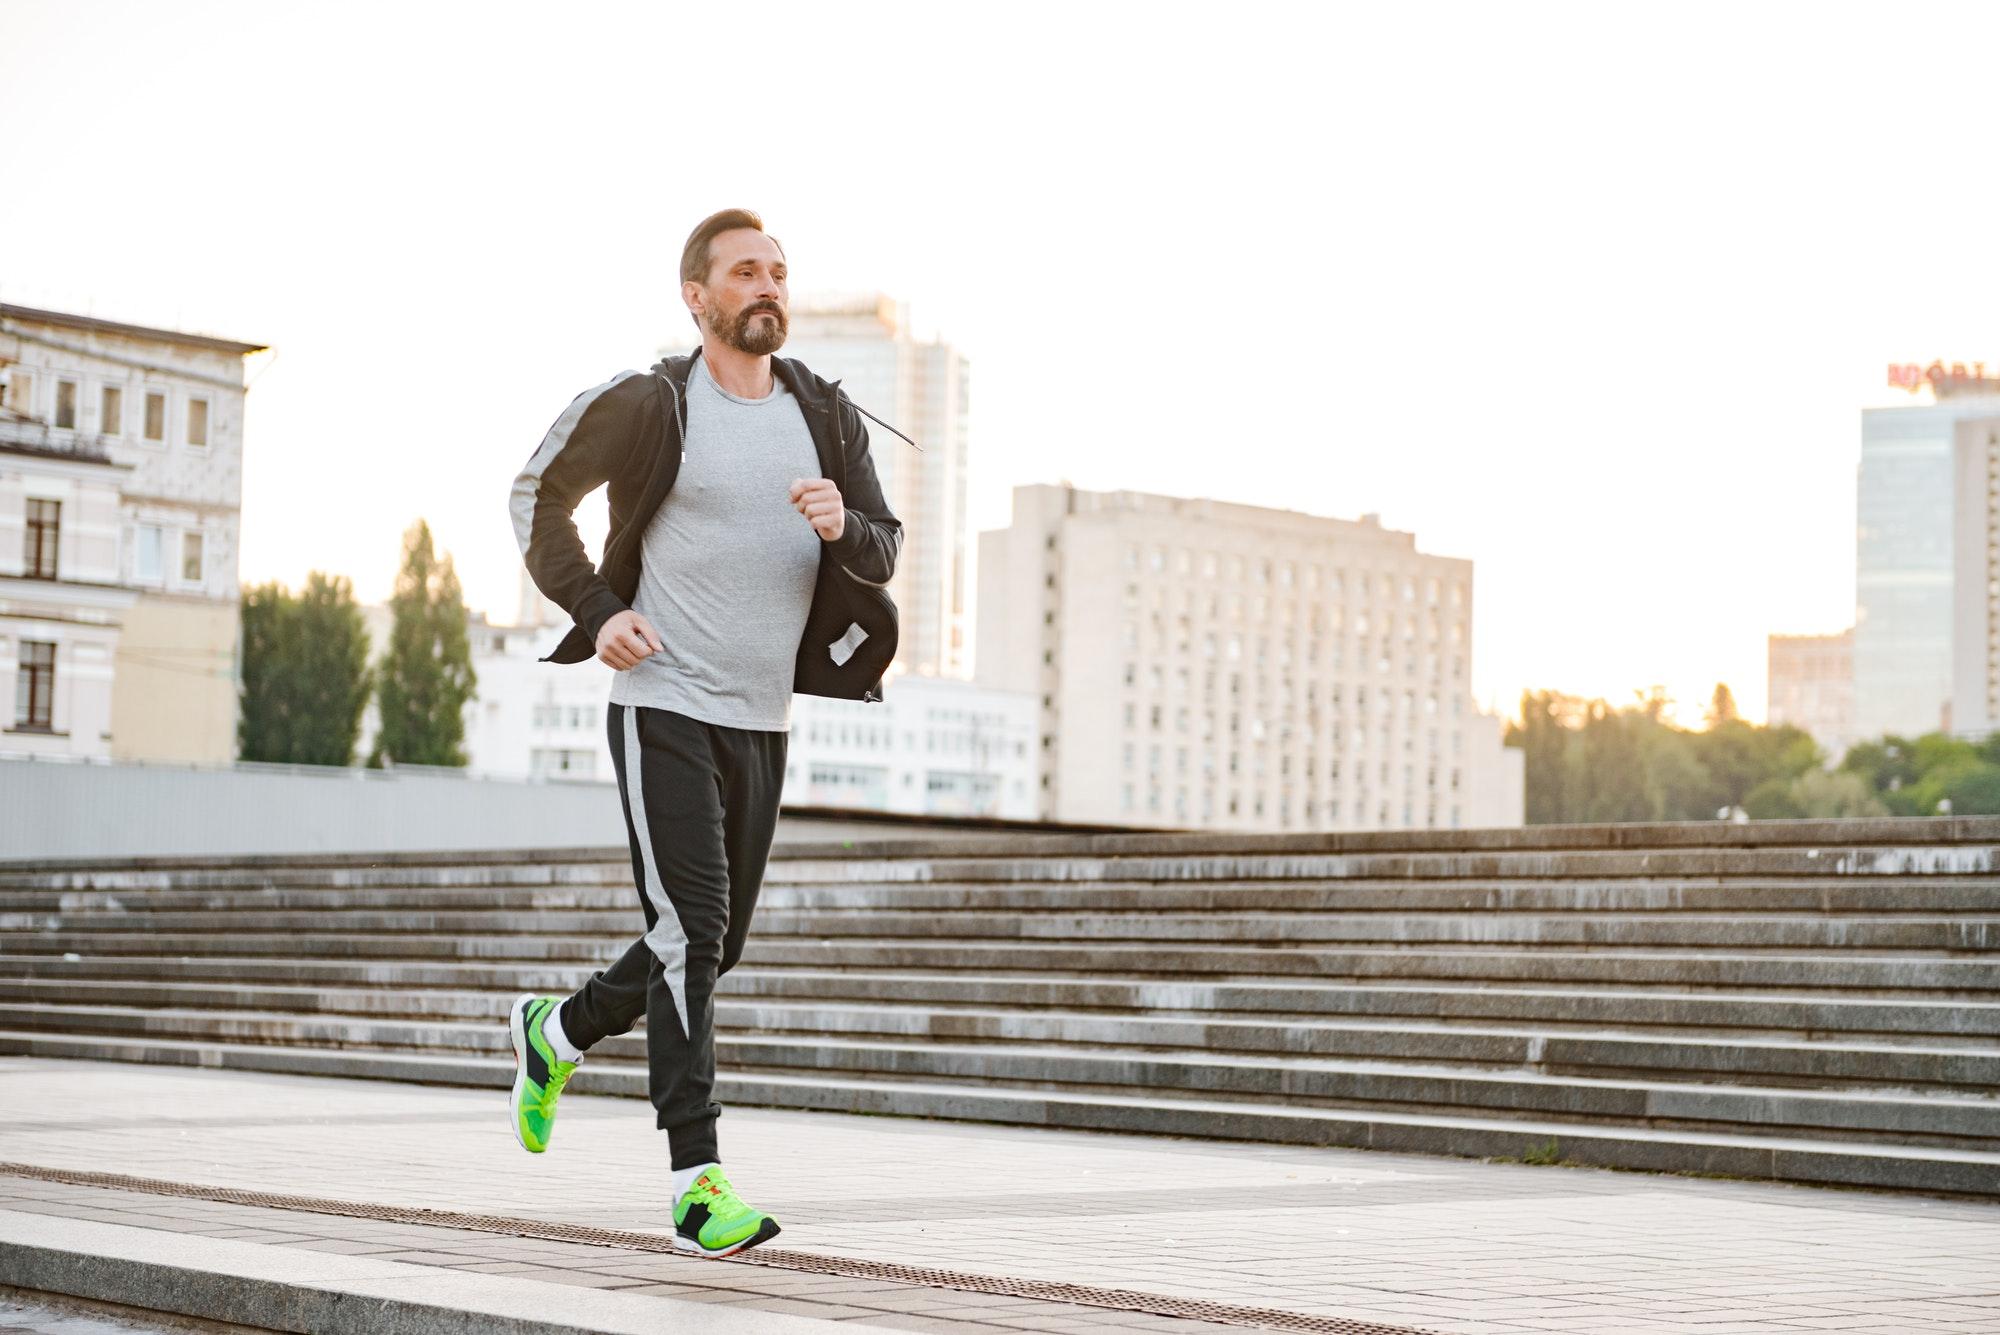 Motivated sportsman running outdoors